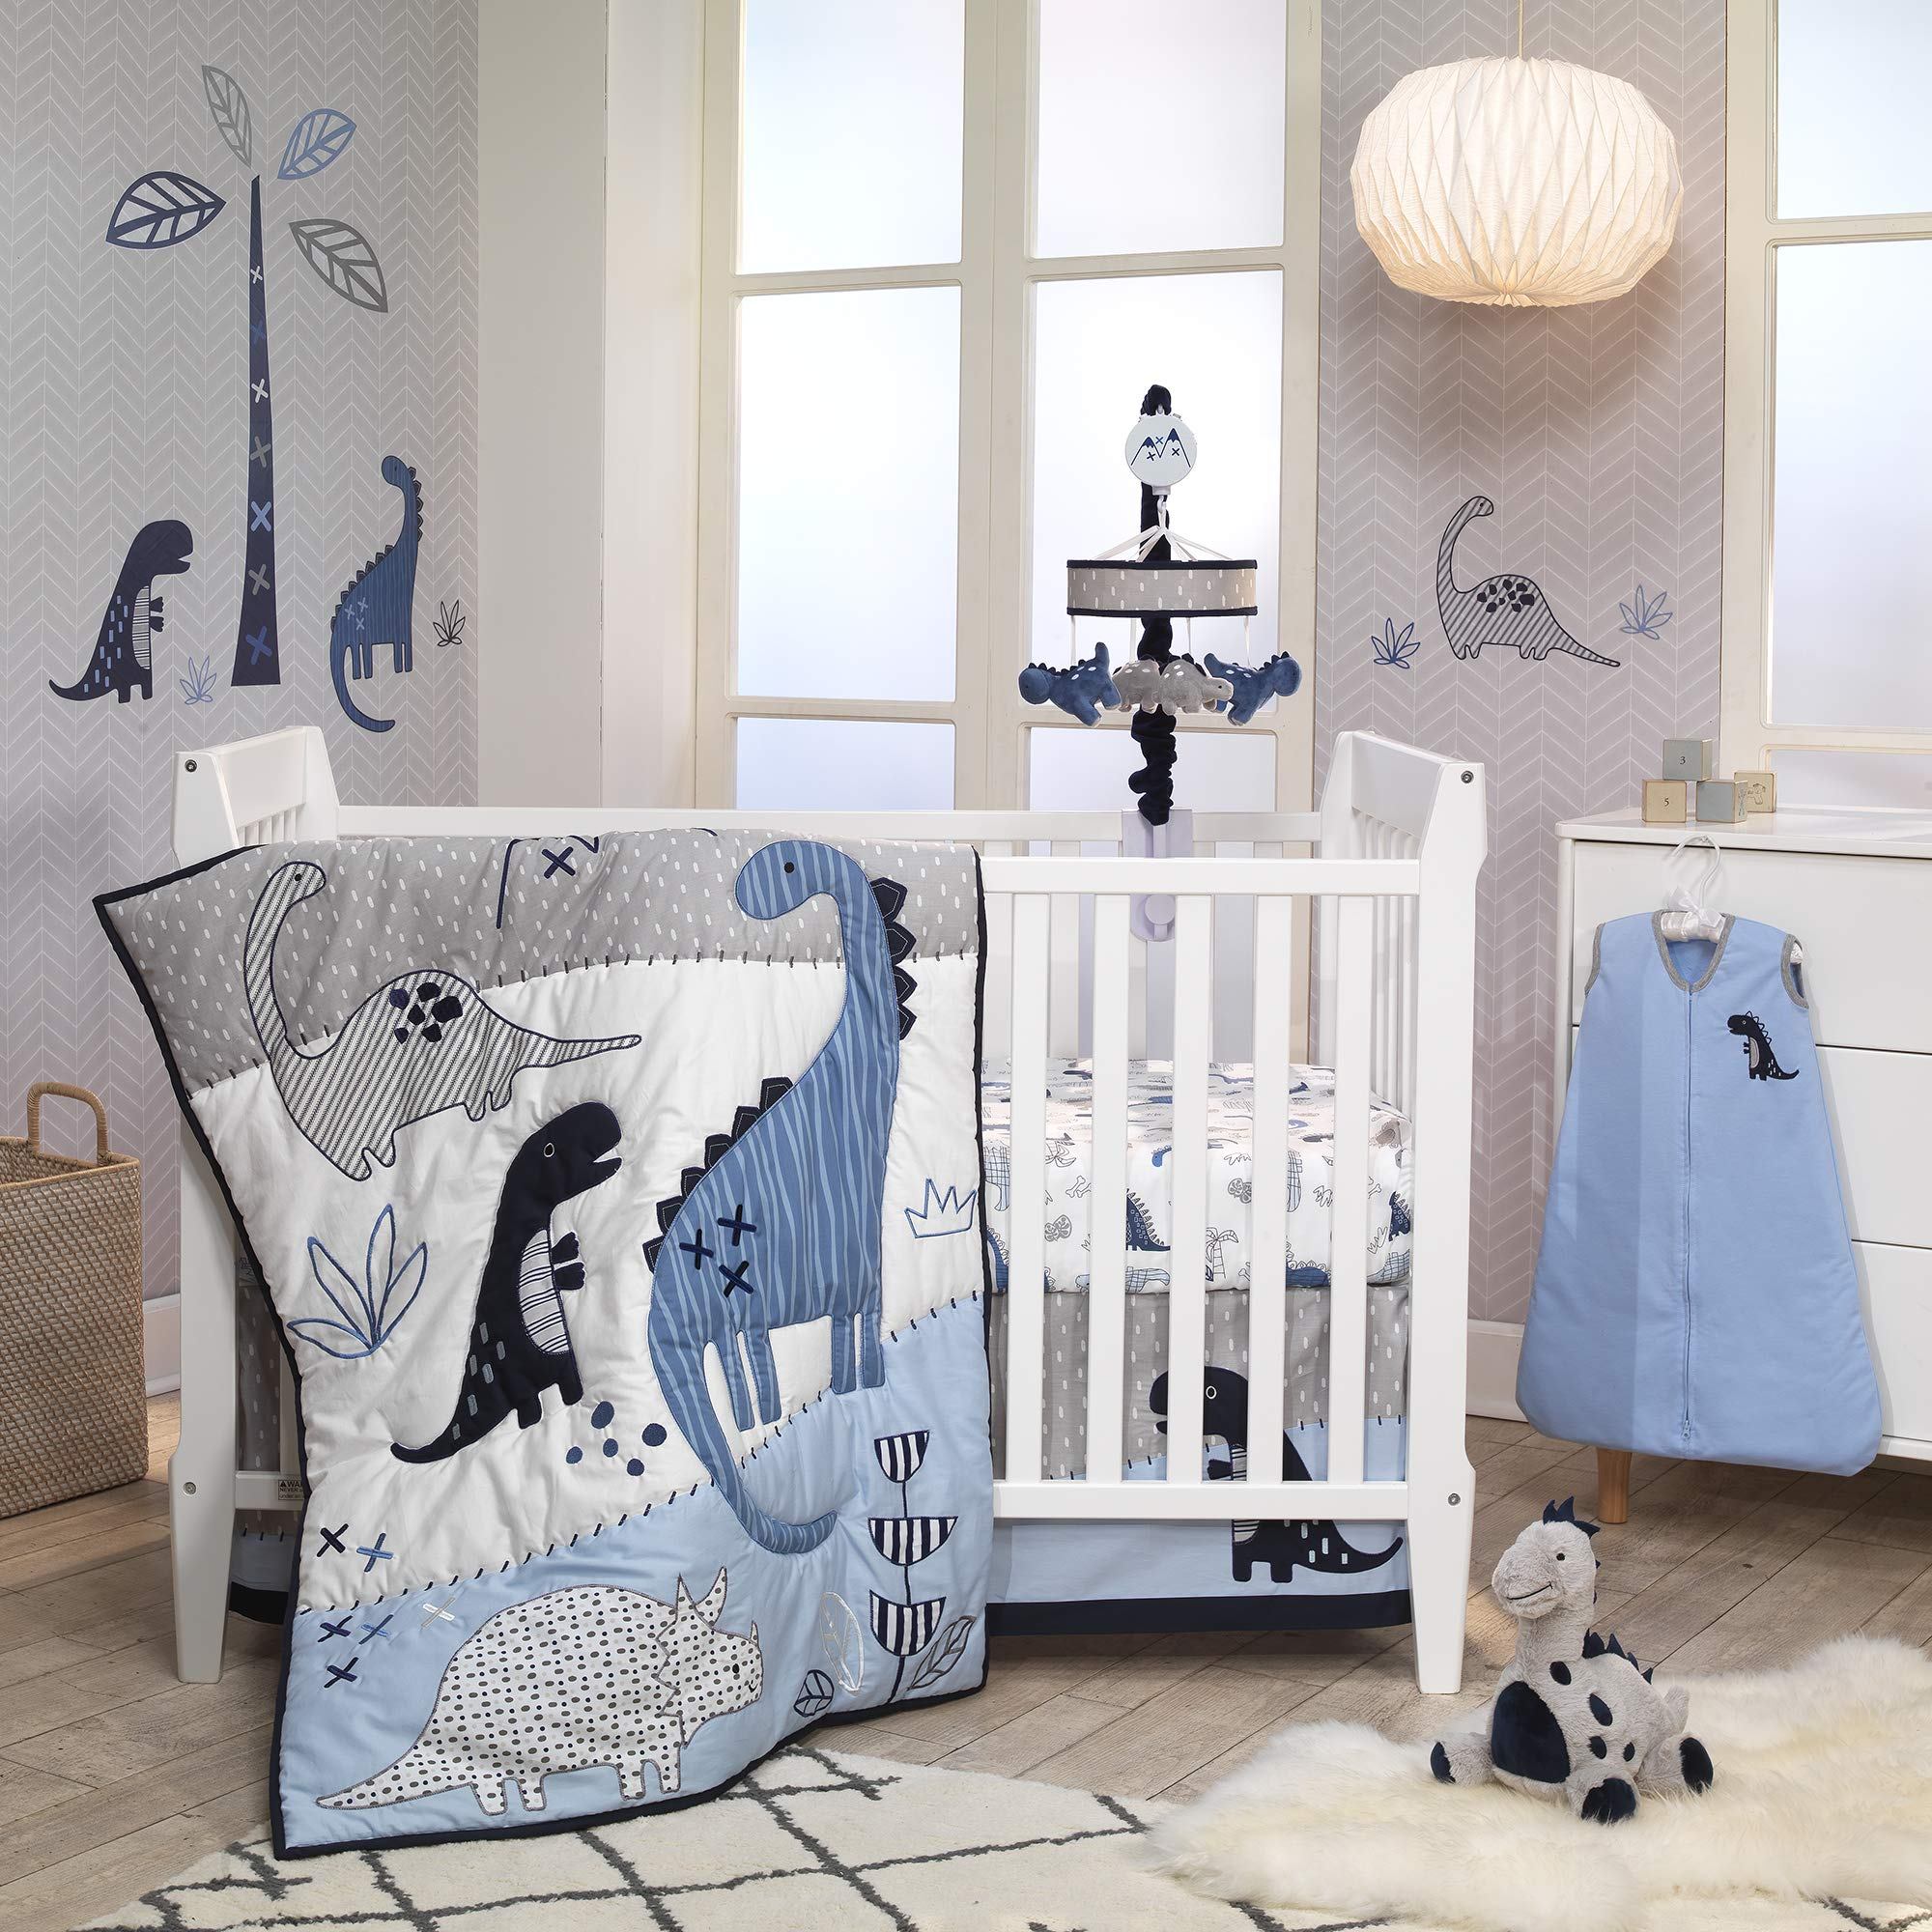 Lambs & Ivy Baby Dino Blue/White Dinosaur Nursery 6-Piece Crib Bedding Set by Lambs & Ivy